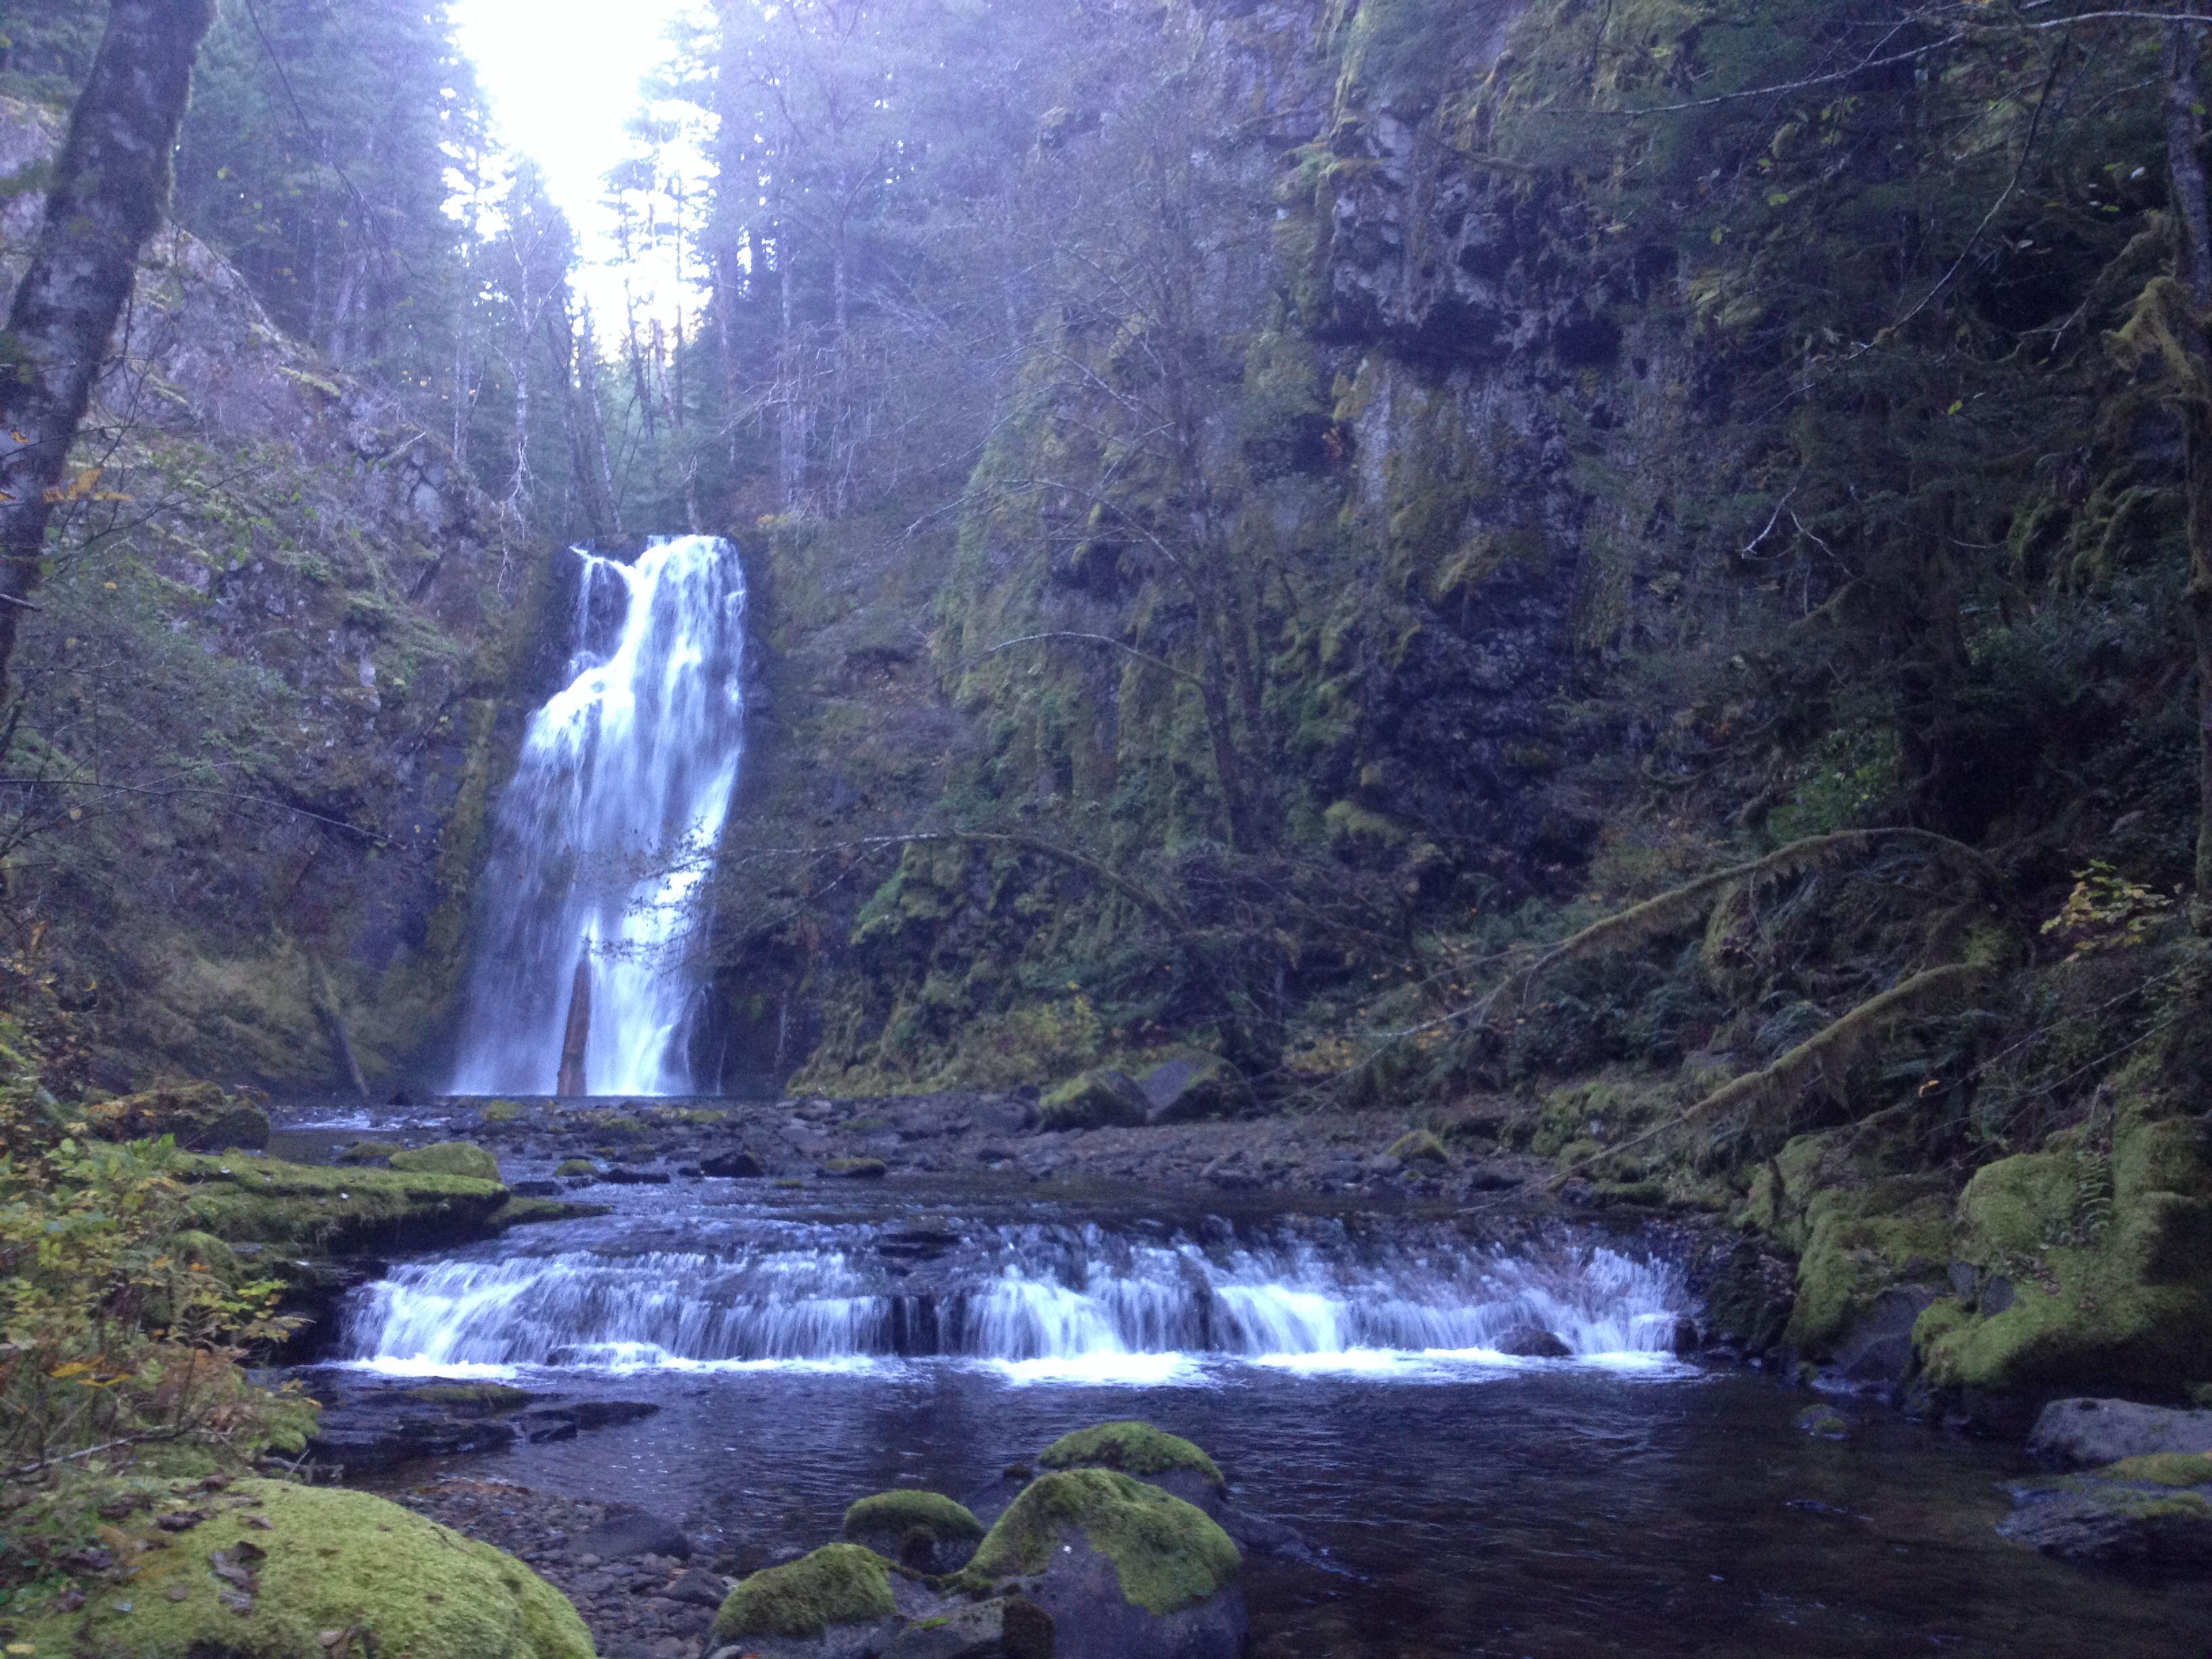 Mowitch Falls, Skamania County, Washington - Northwest